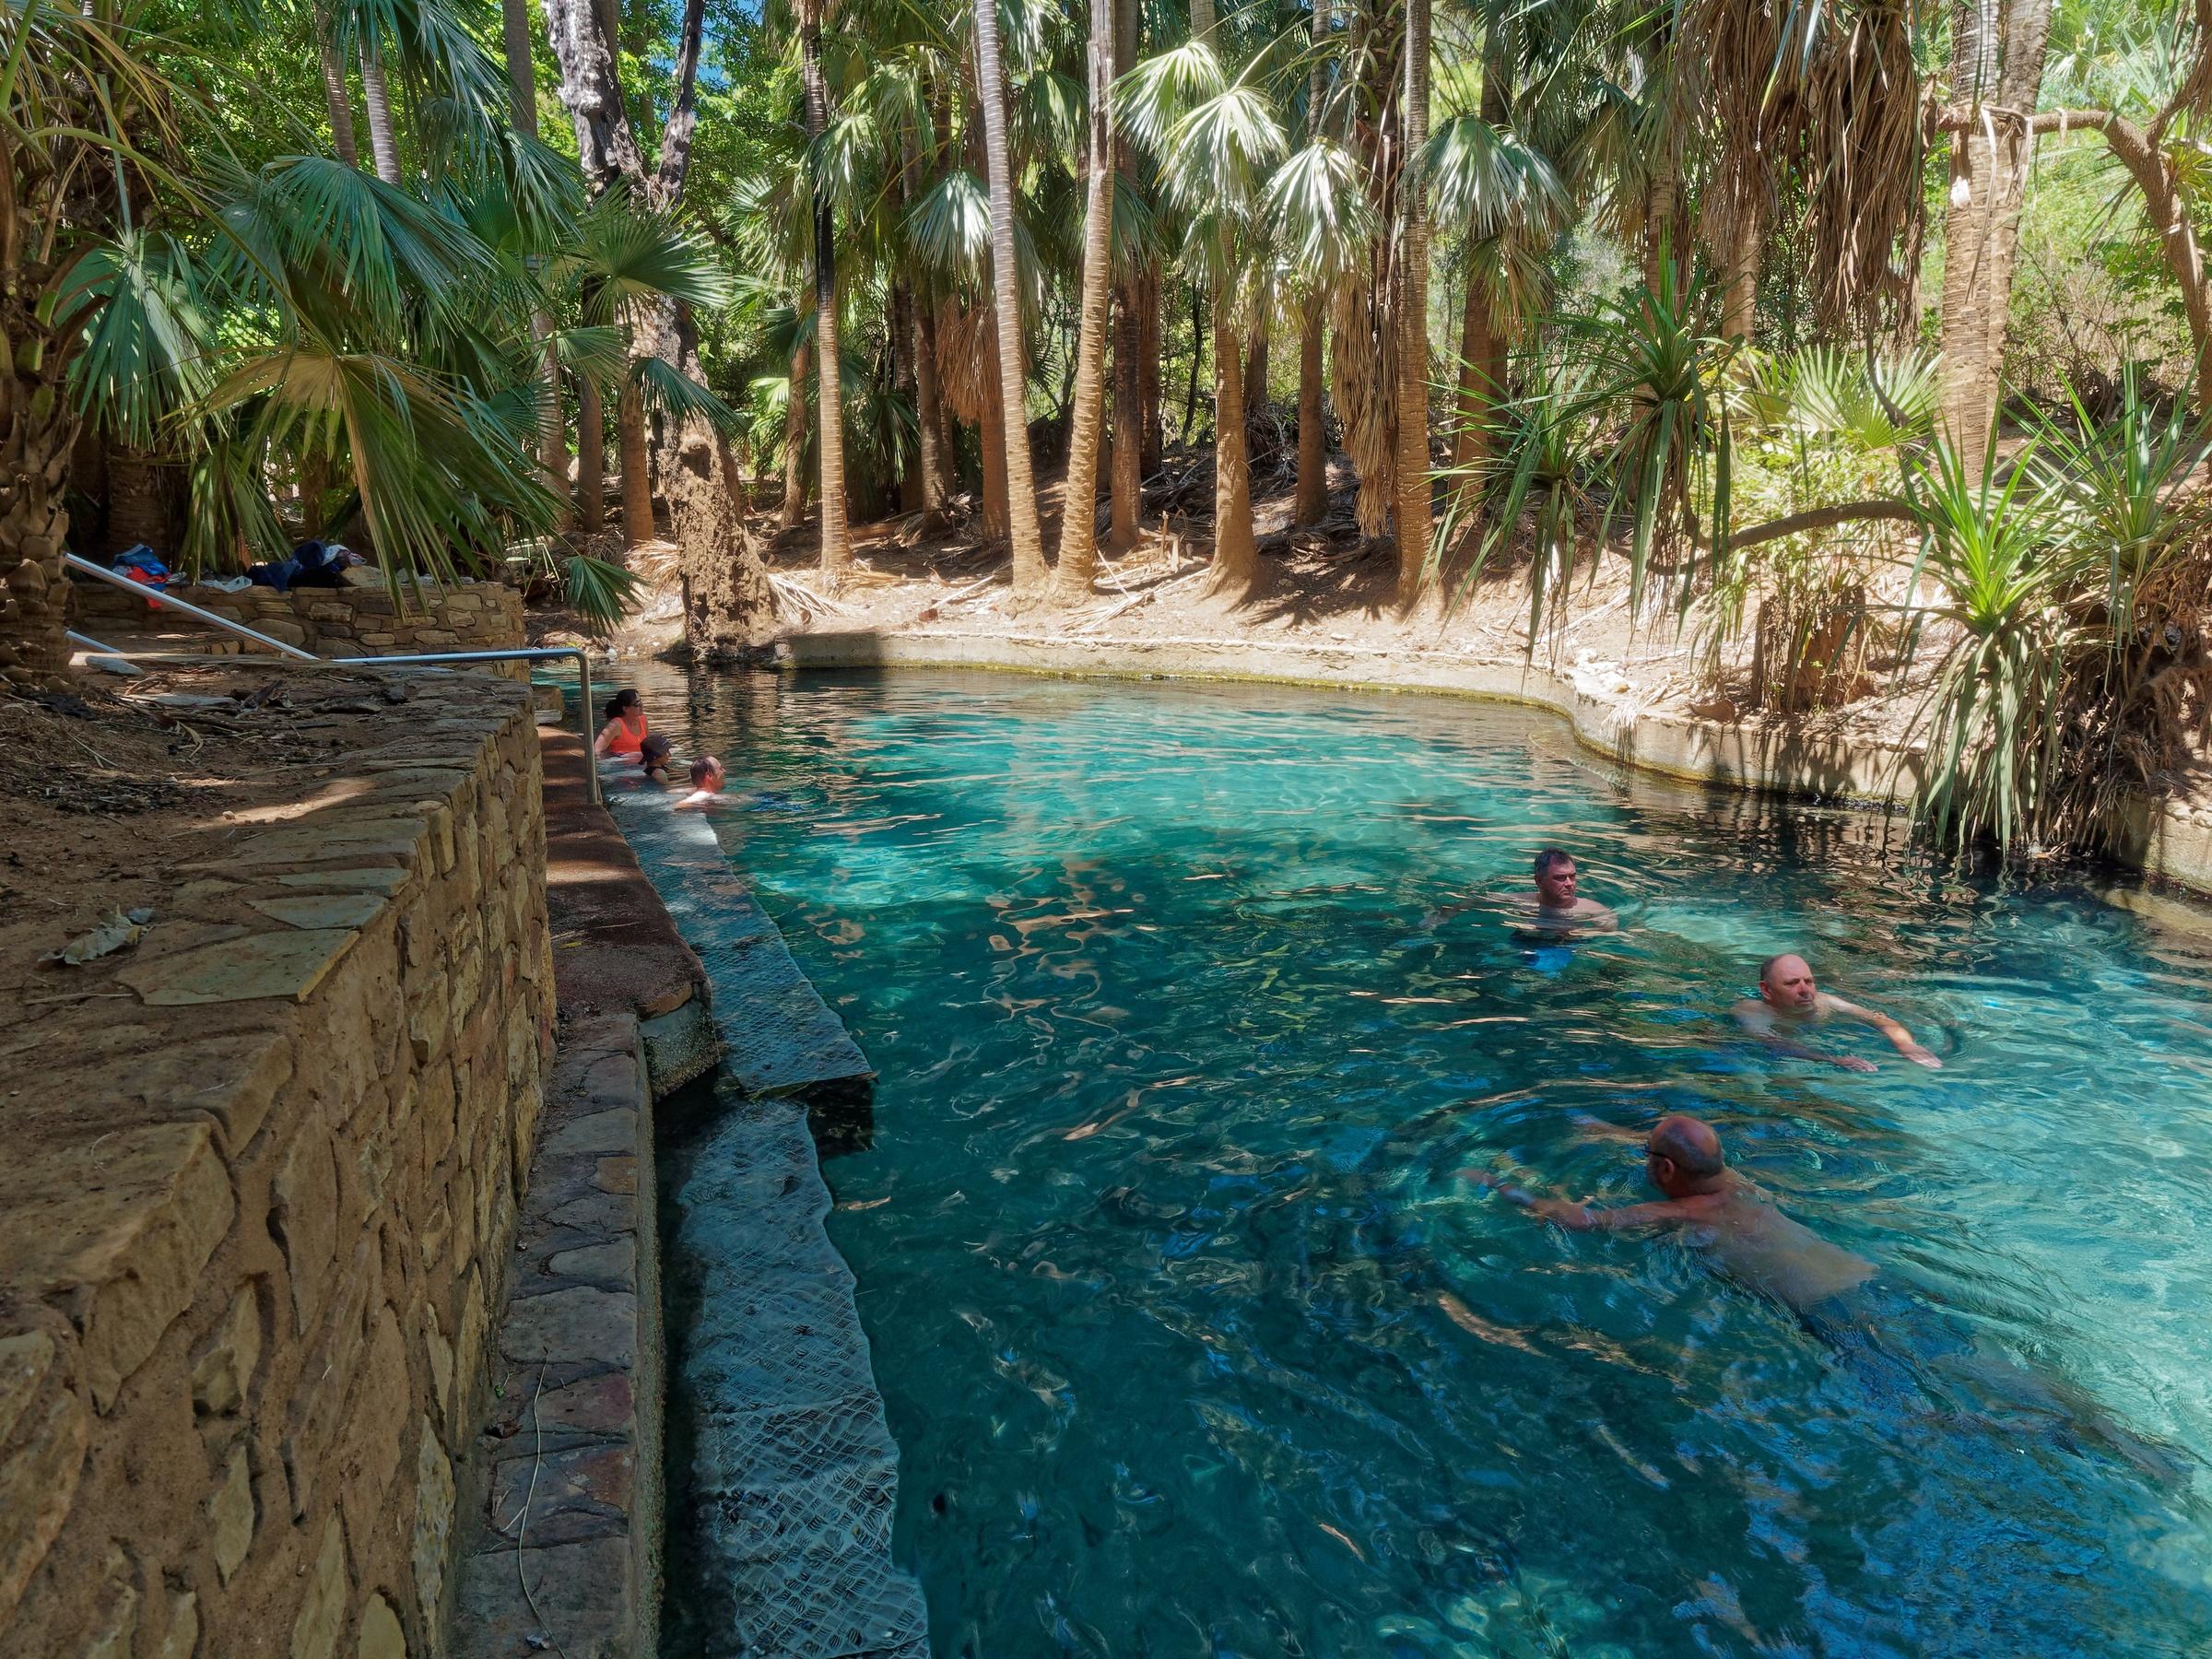 Mataranka Thermal Pools